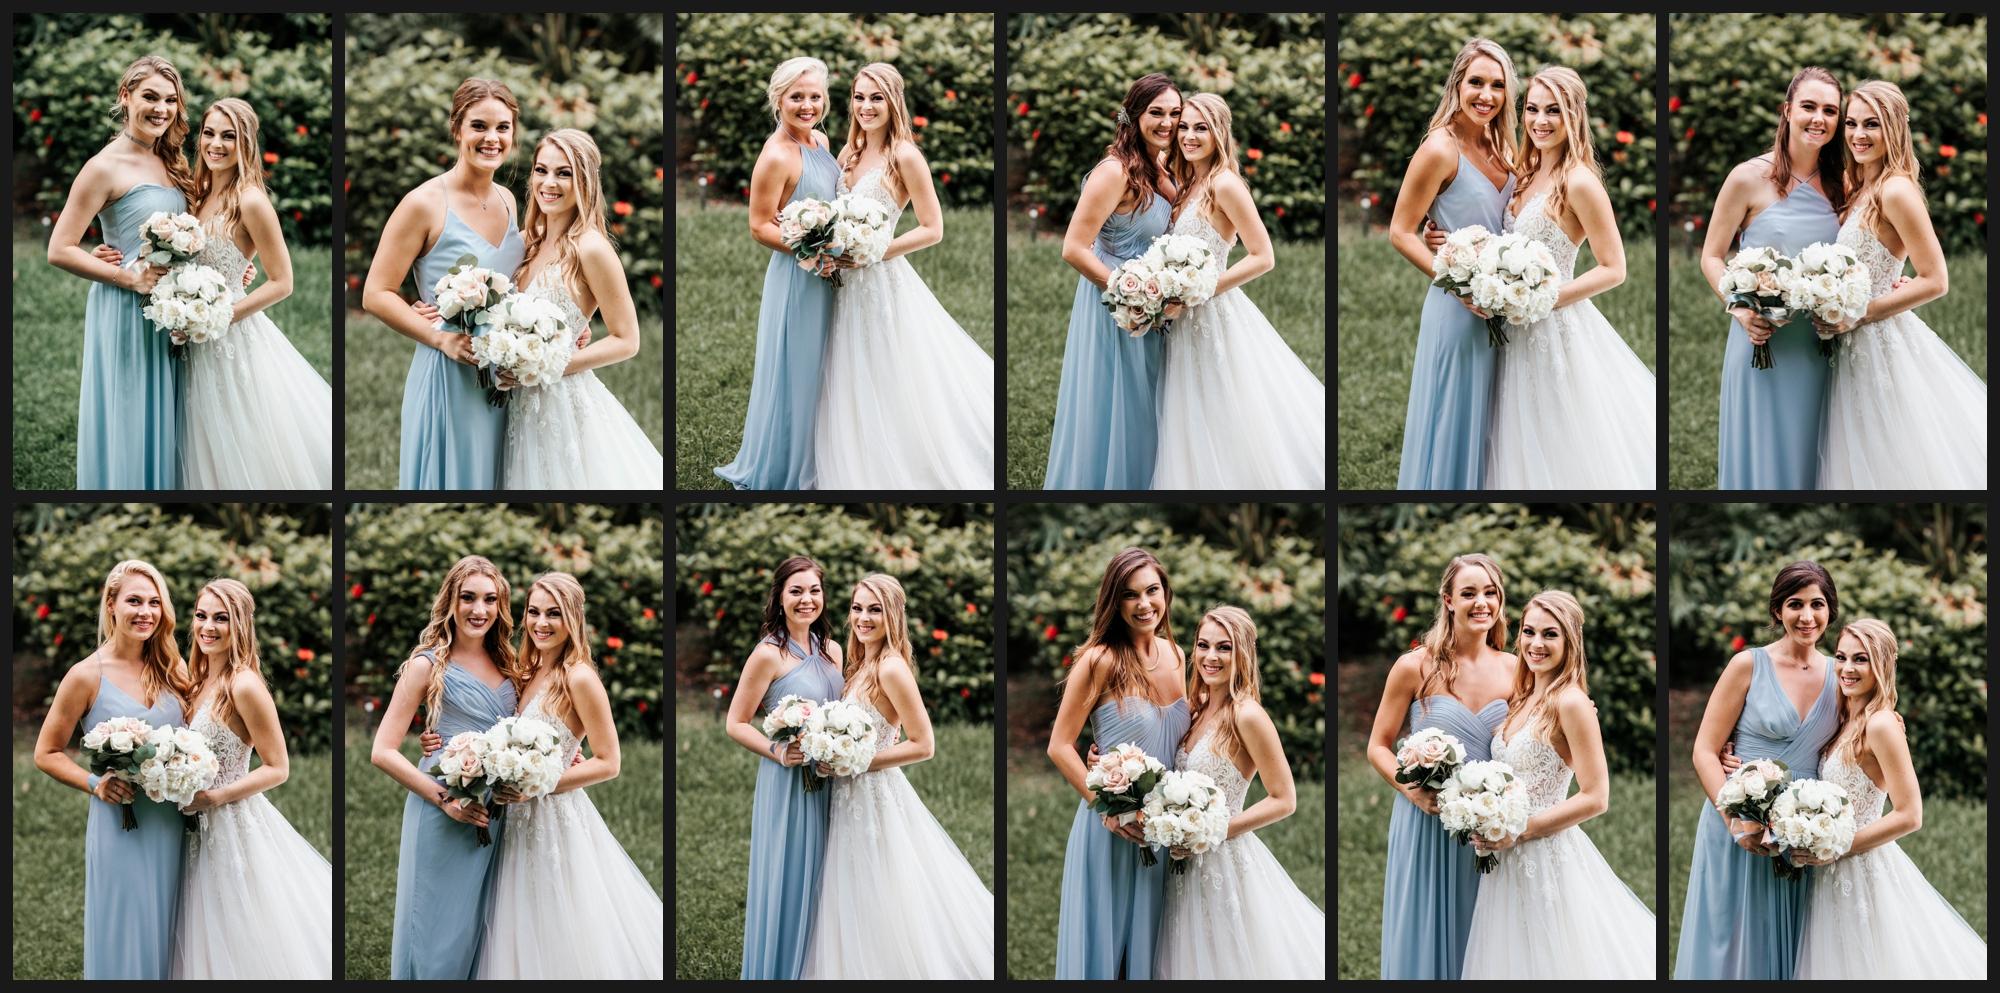 Orlando-Wedding-Photographer-destination-wedding-photographer-florida-wedding-photographer-bohemian-wedding-photographer_0009.jpg